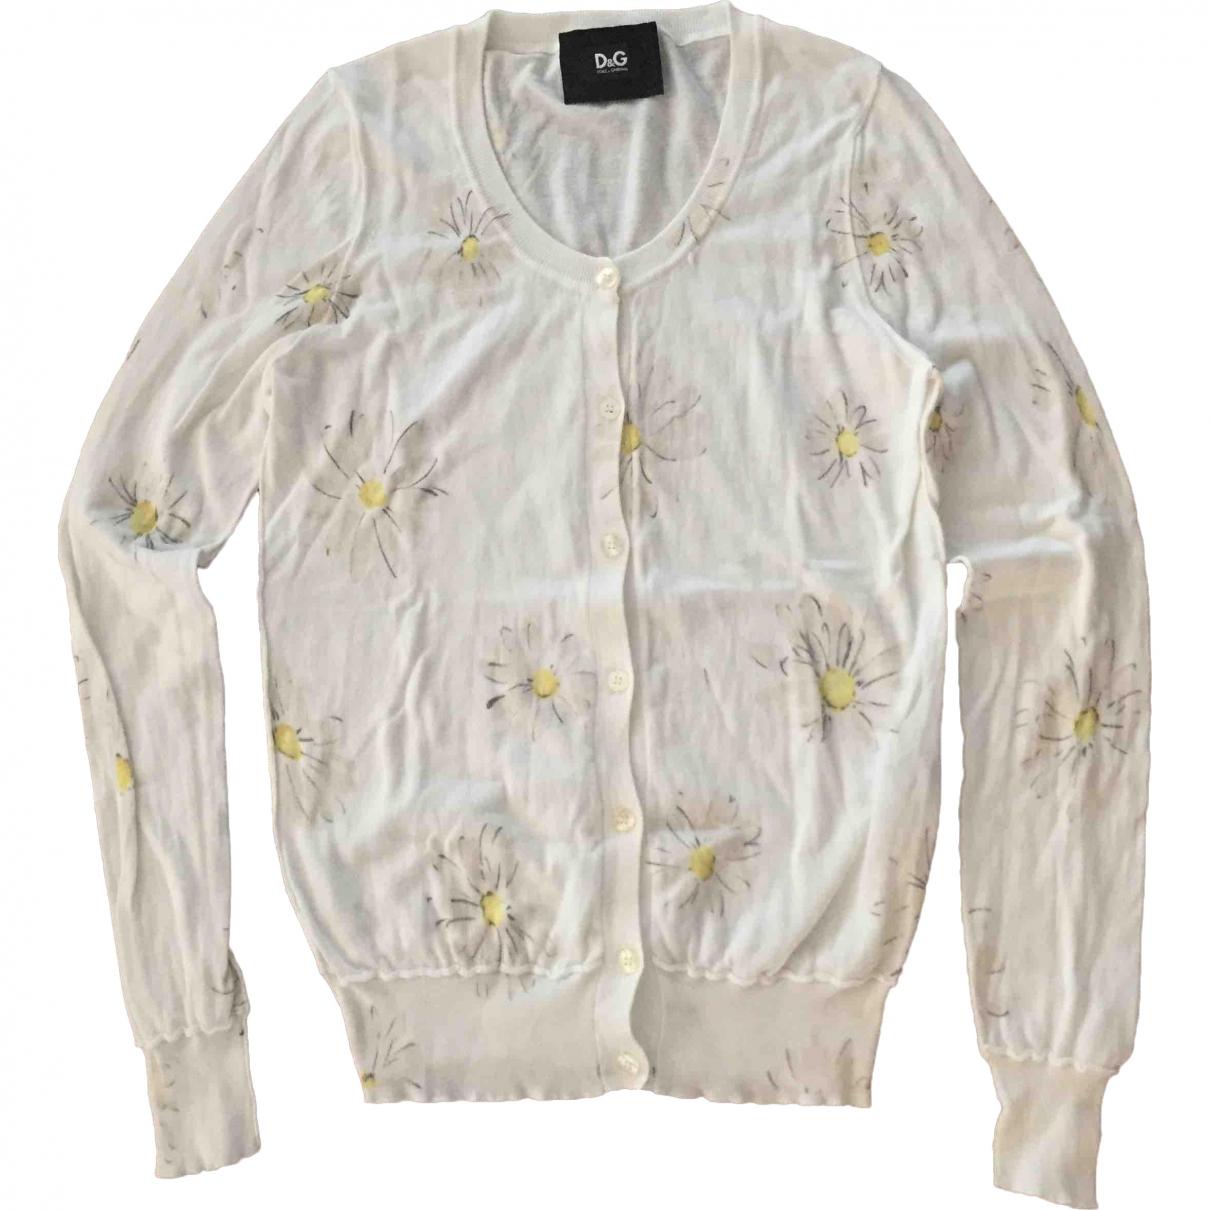 D&g \N Pullover in  Weiss Baumwolle